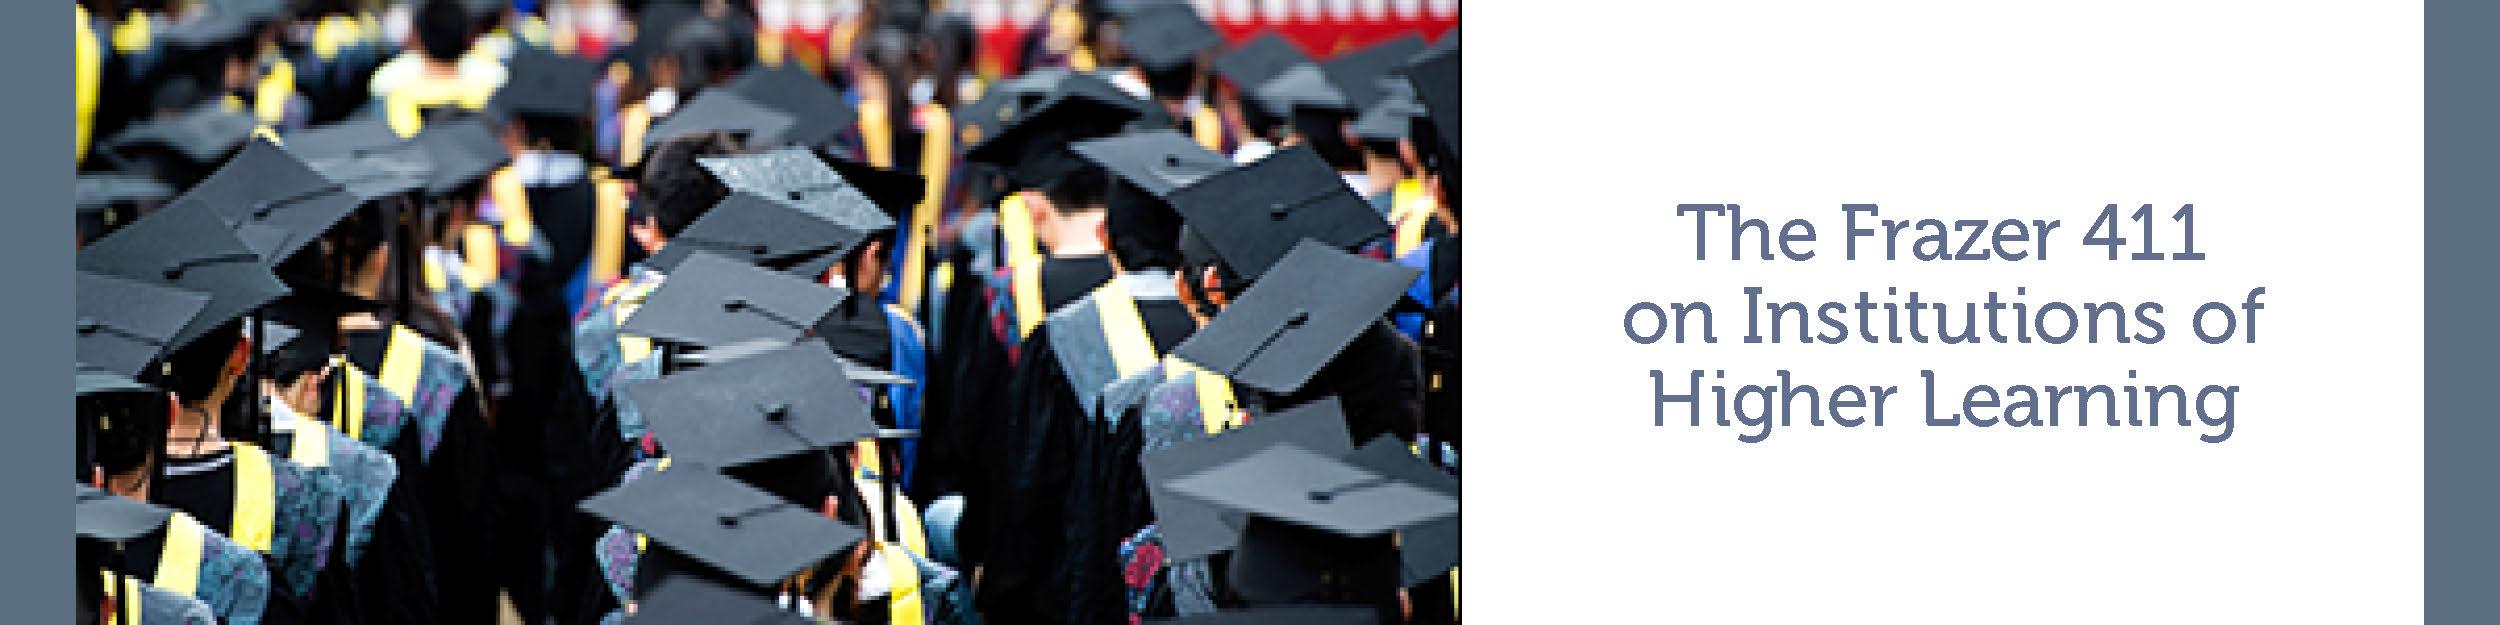 Frazer LLP Institutions of Higher Learning